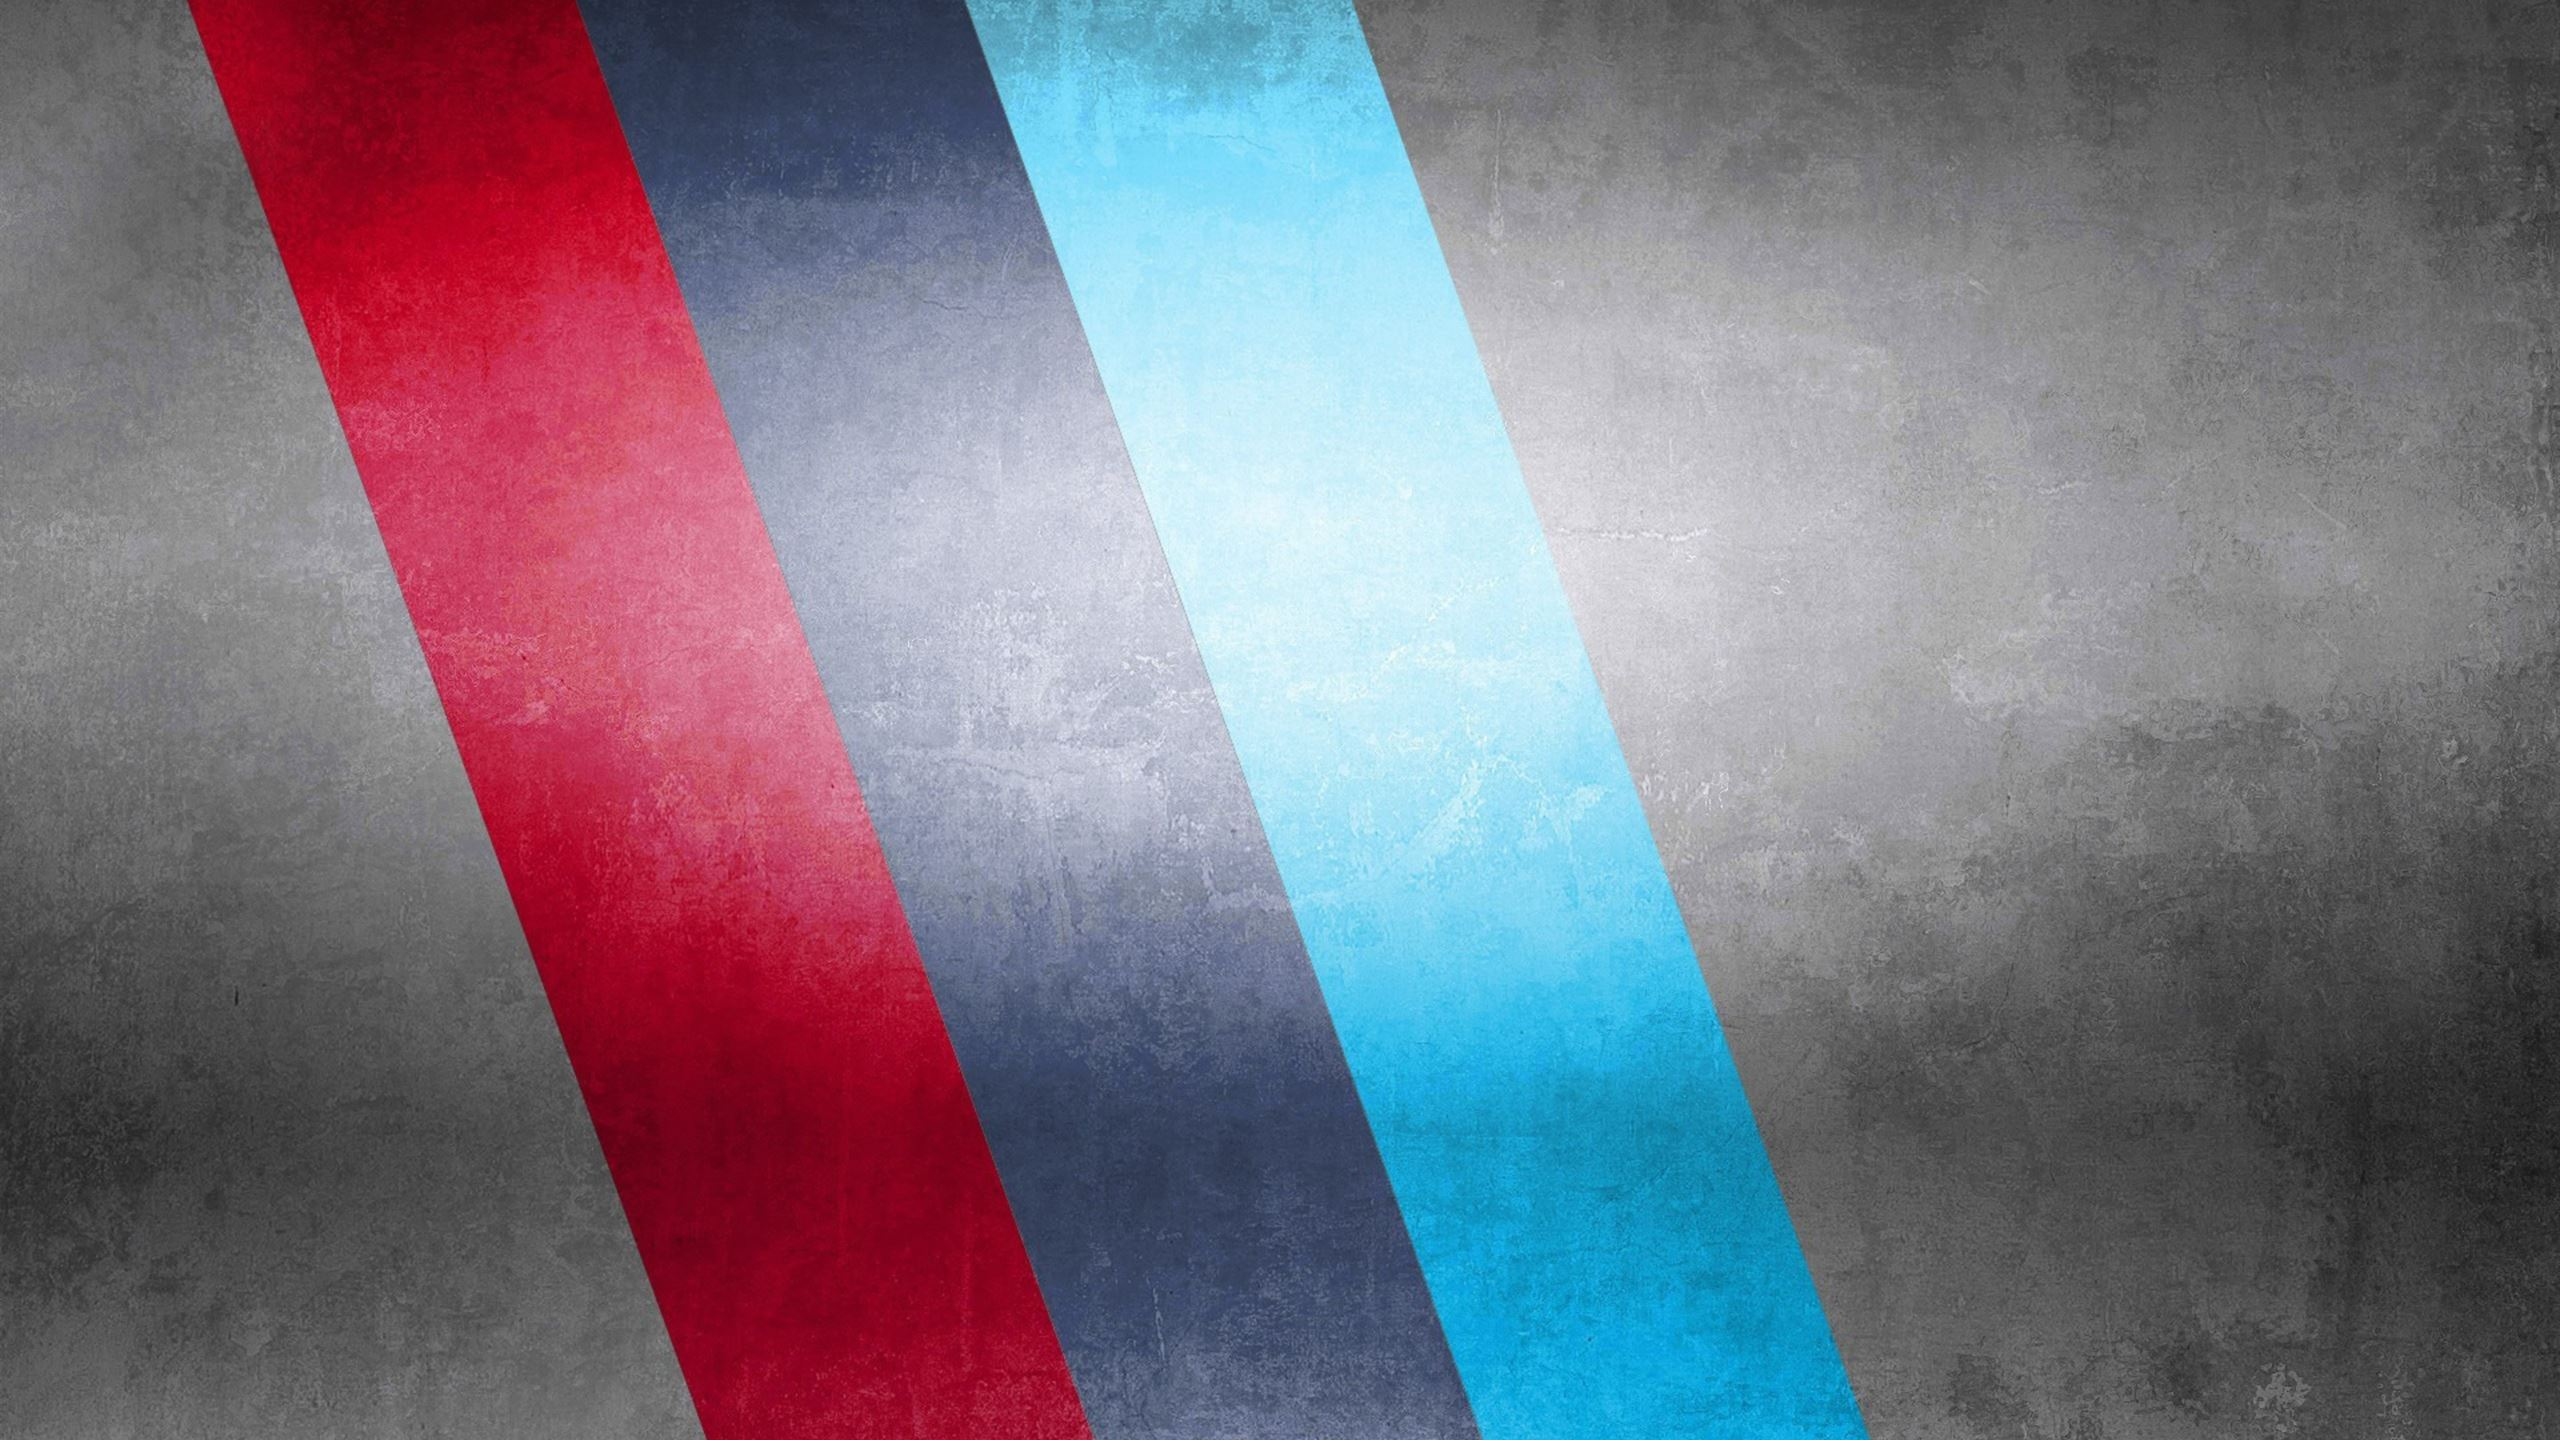 Grunge Stripes Mac Wallpaper Download | AllMacWallpaper